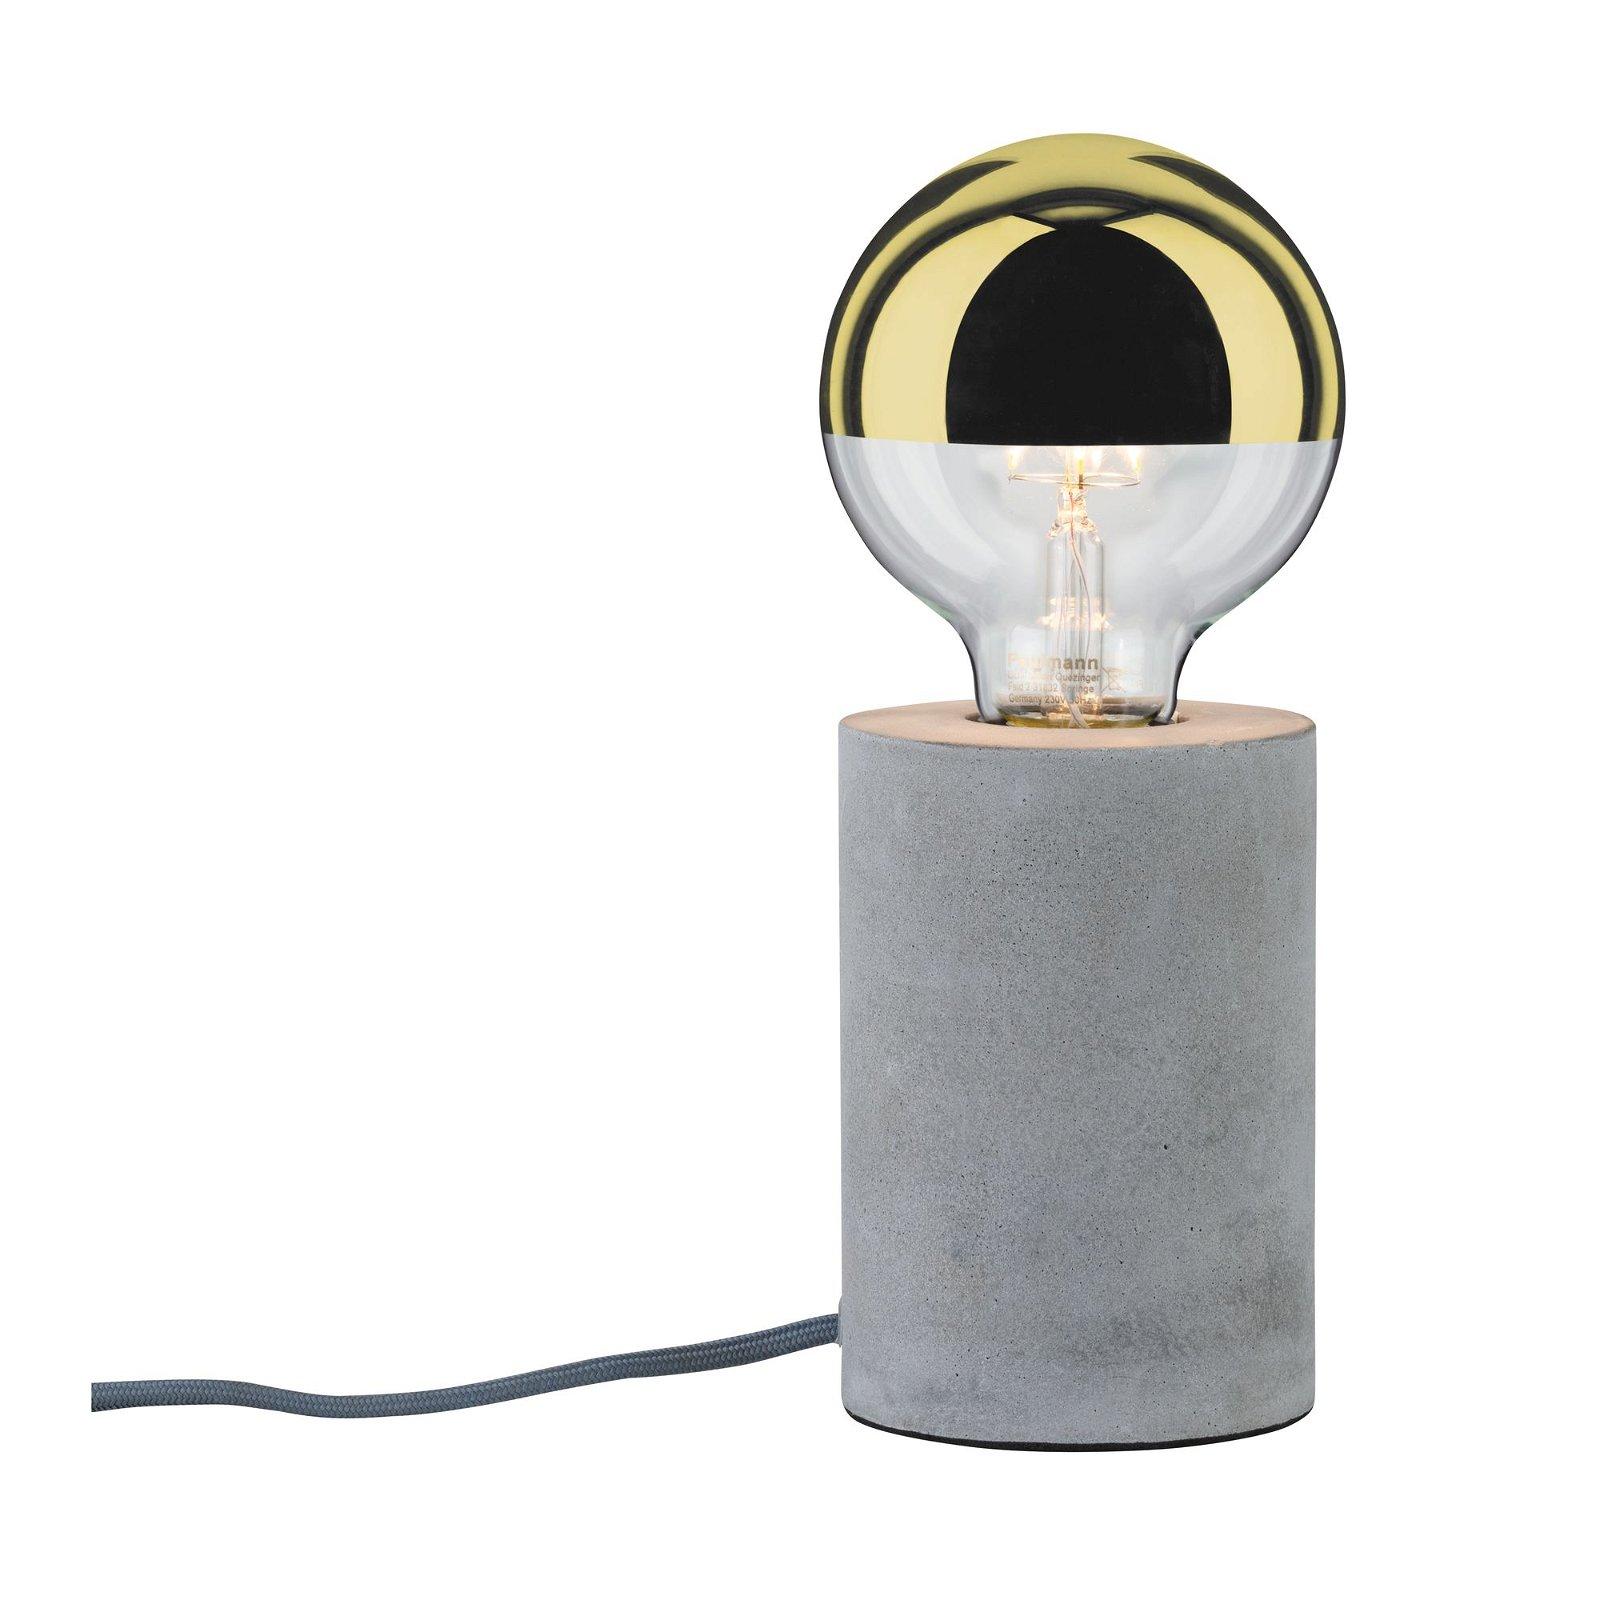 Neordic LED-tafellamp Mik E27 max. 20W Grijs Beton